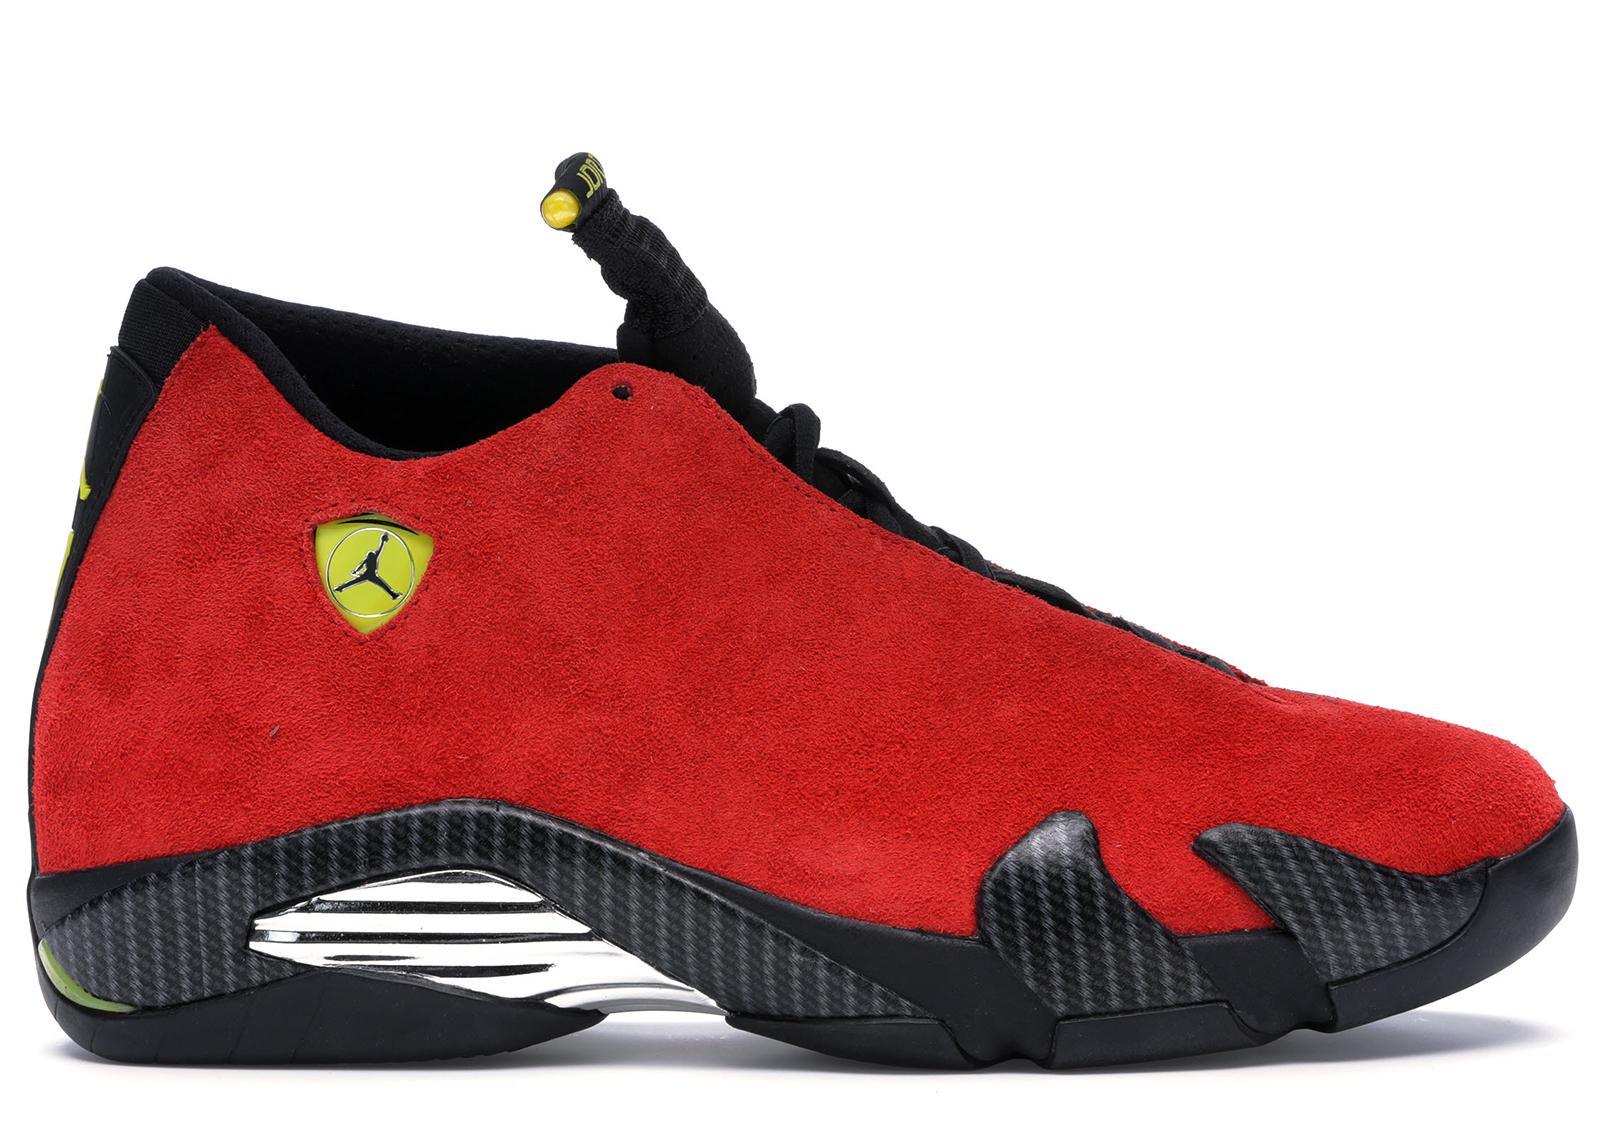 Jordan 14 Retro Challenge Red